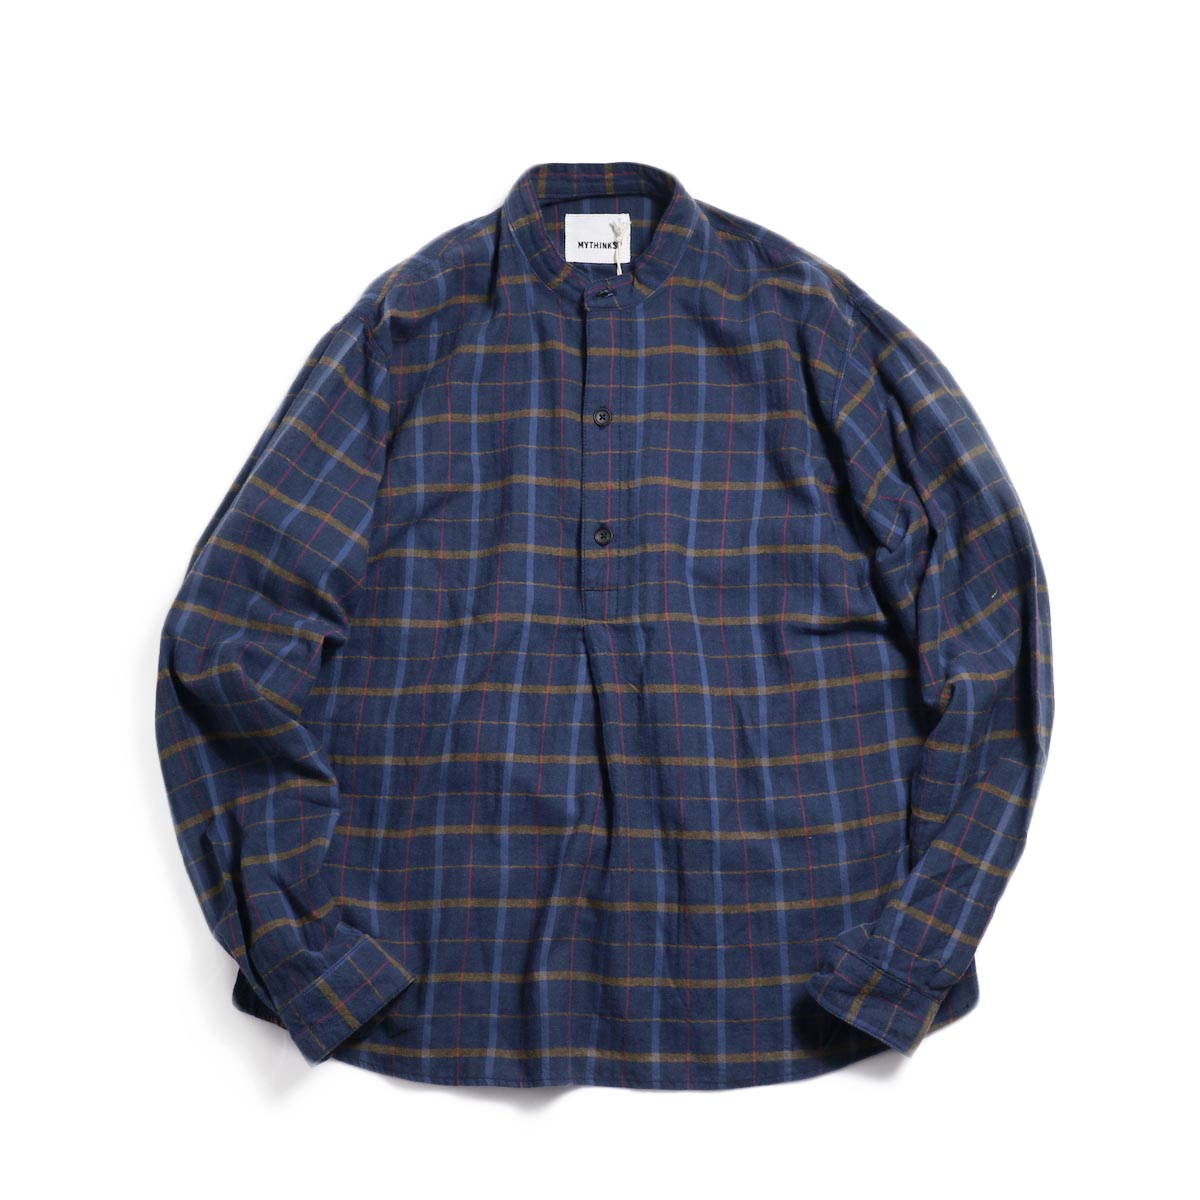 MYTHINKS (Men's) / MY Check Stand Collar Shirt -Navy